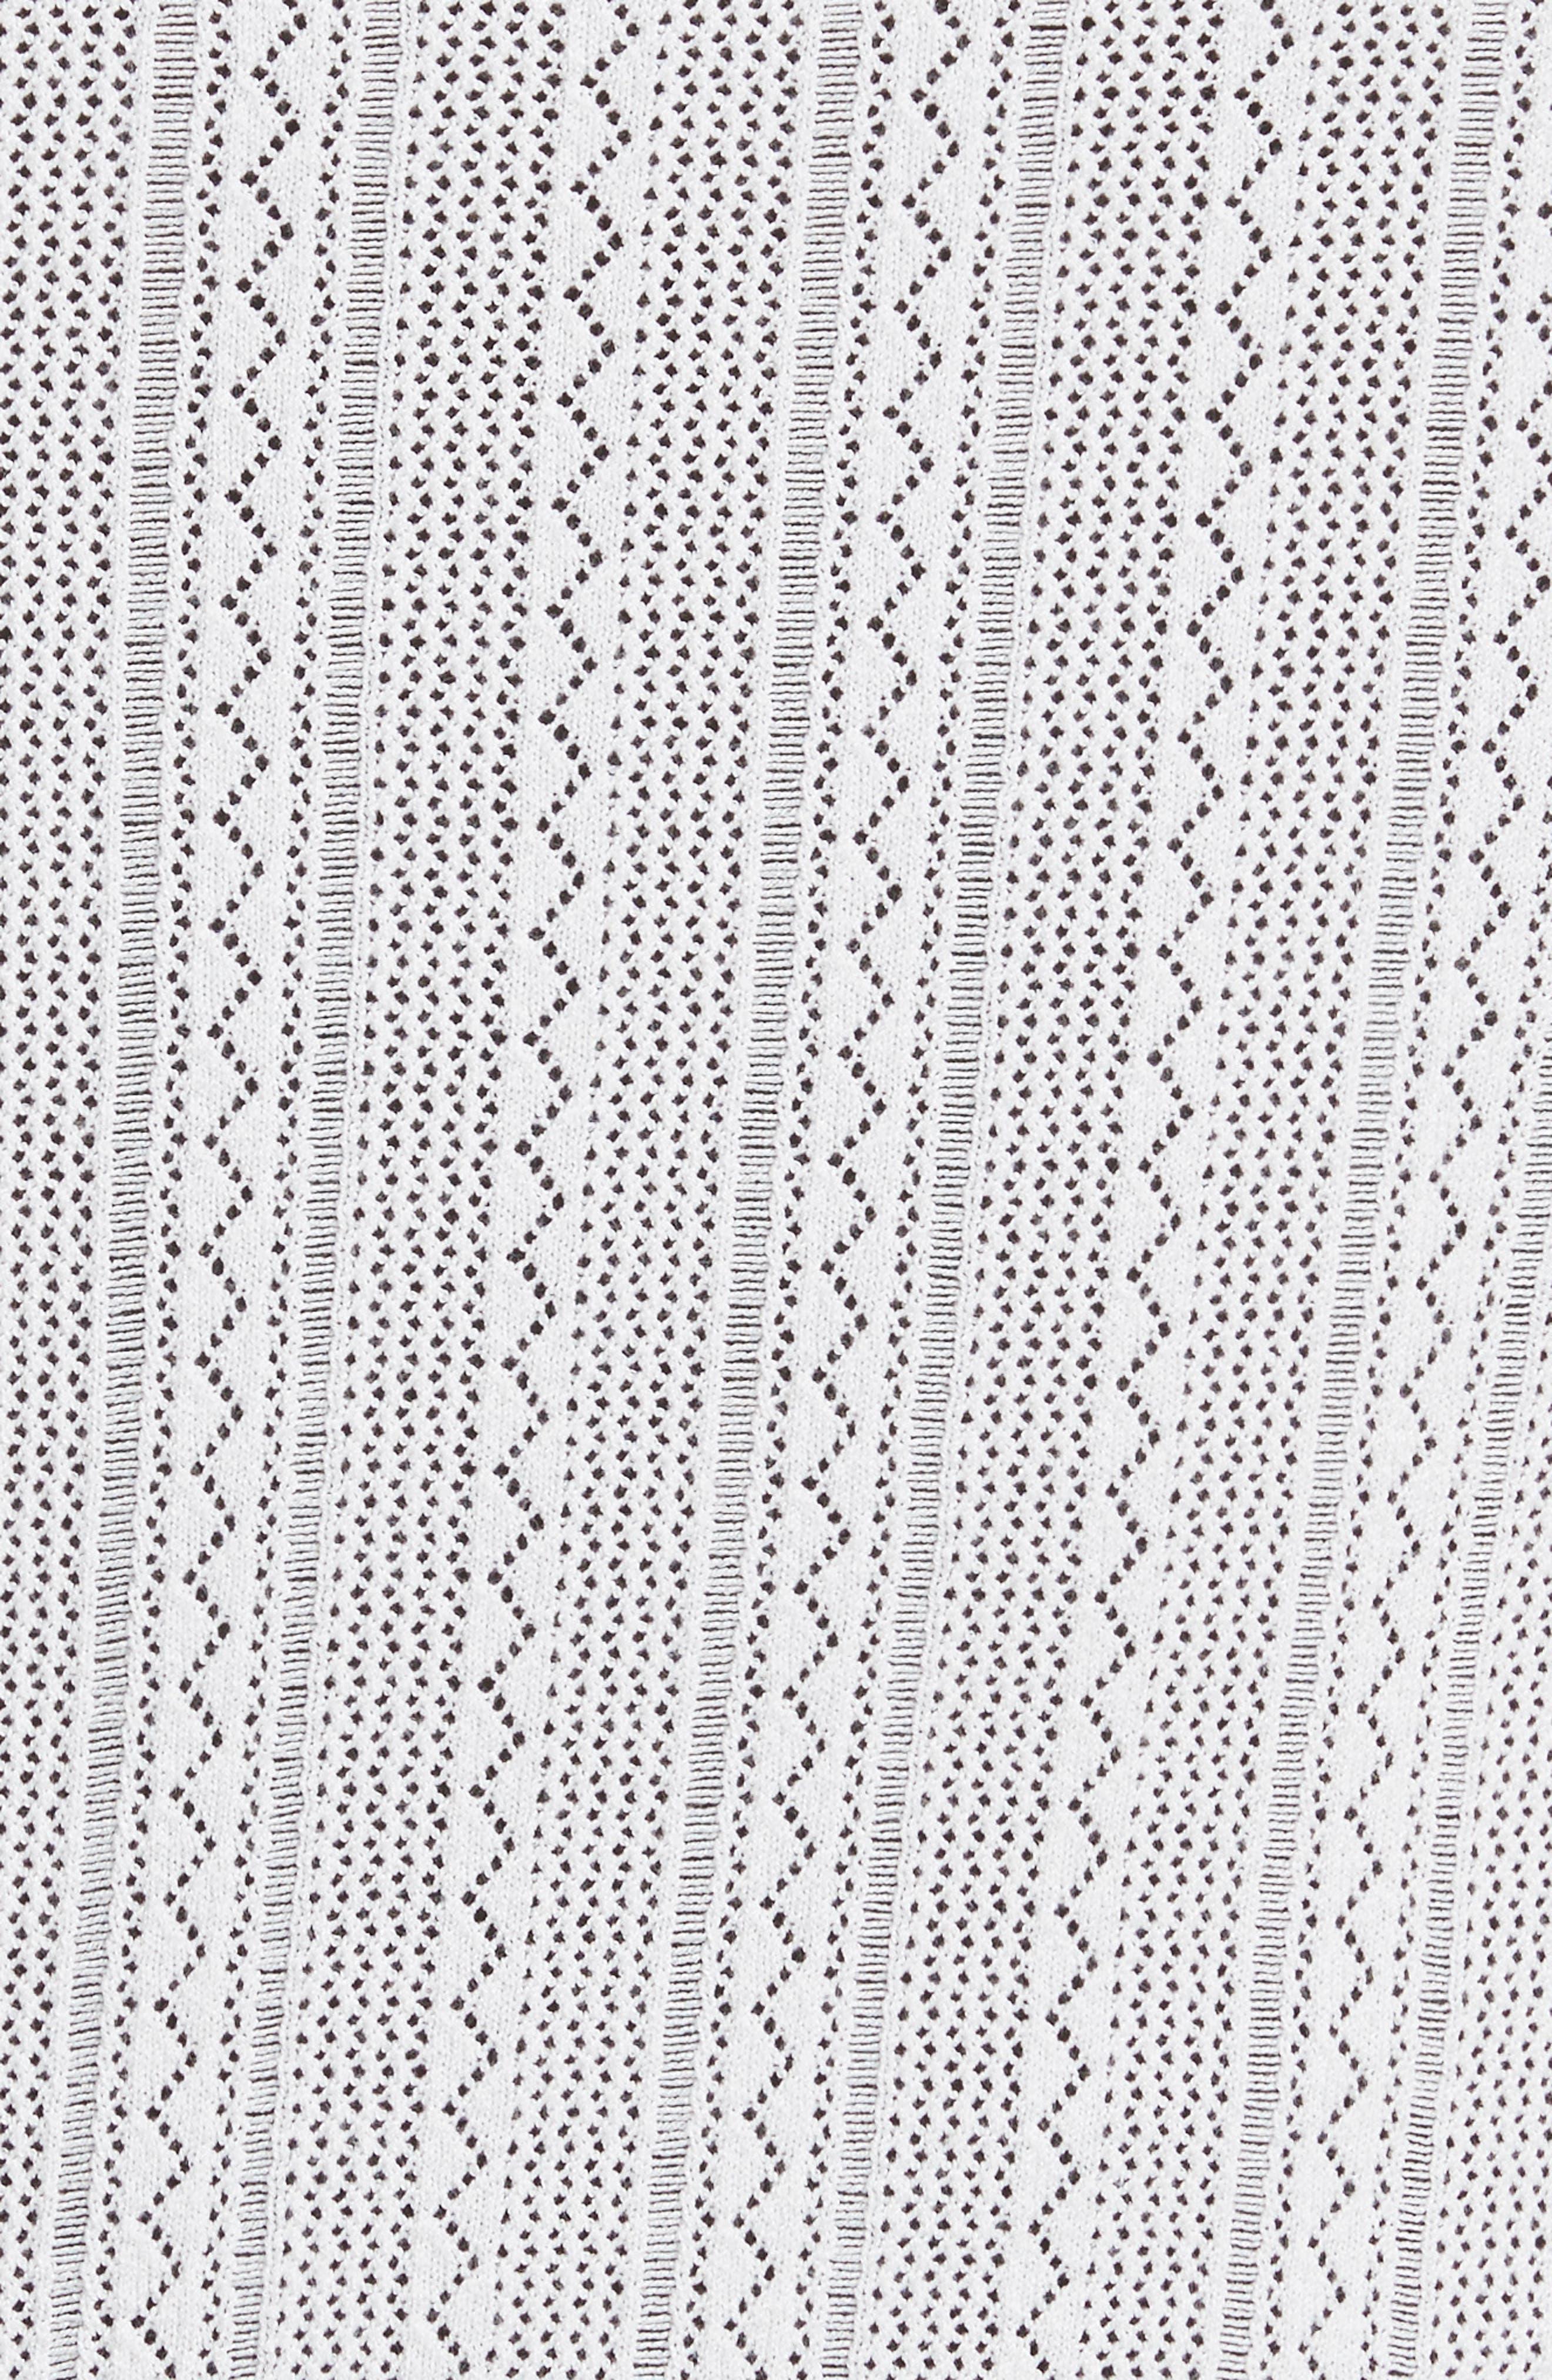 Prosecco Lace Knit Cardigan,                             Alternate thumbnail 5, color,                             Eggshell